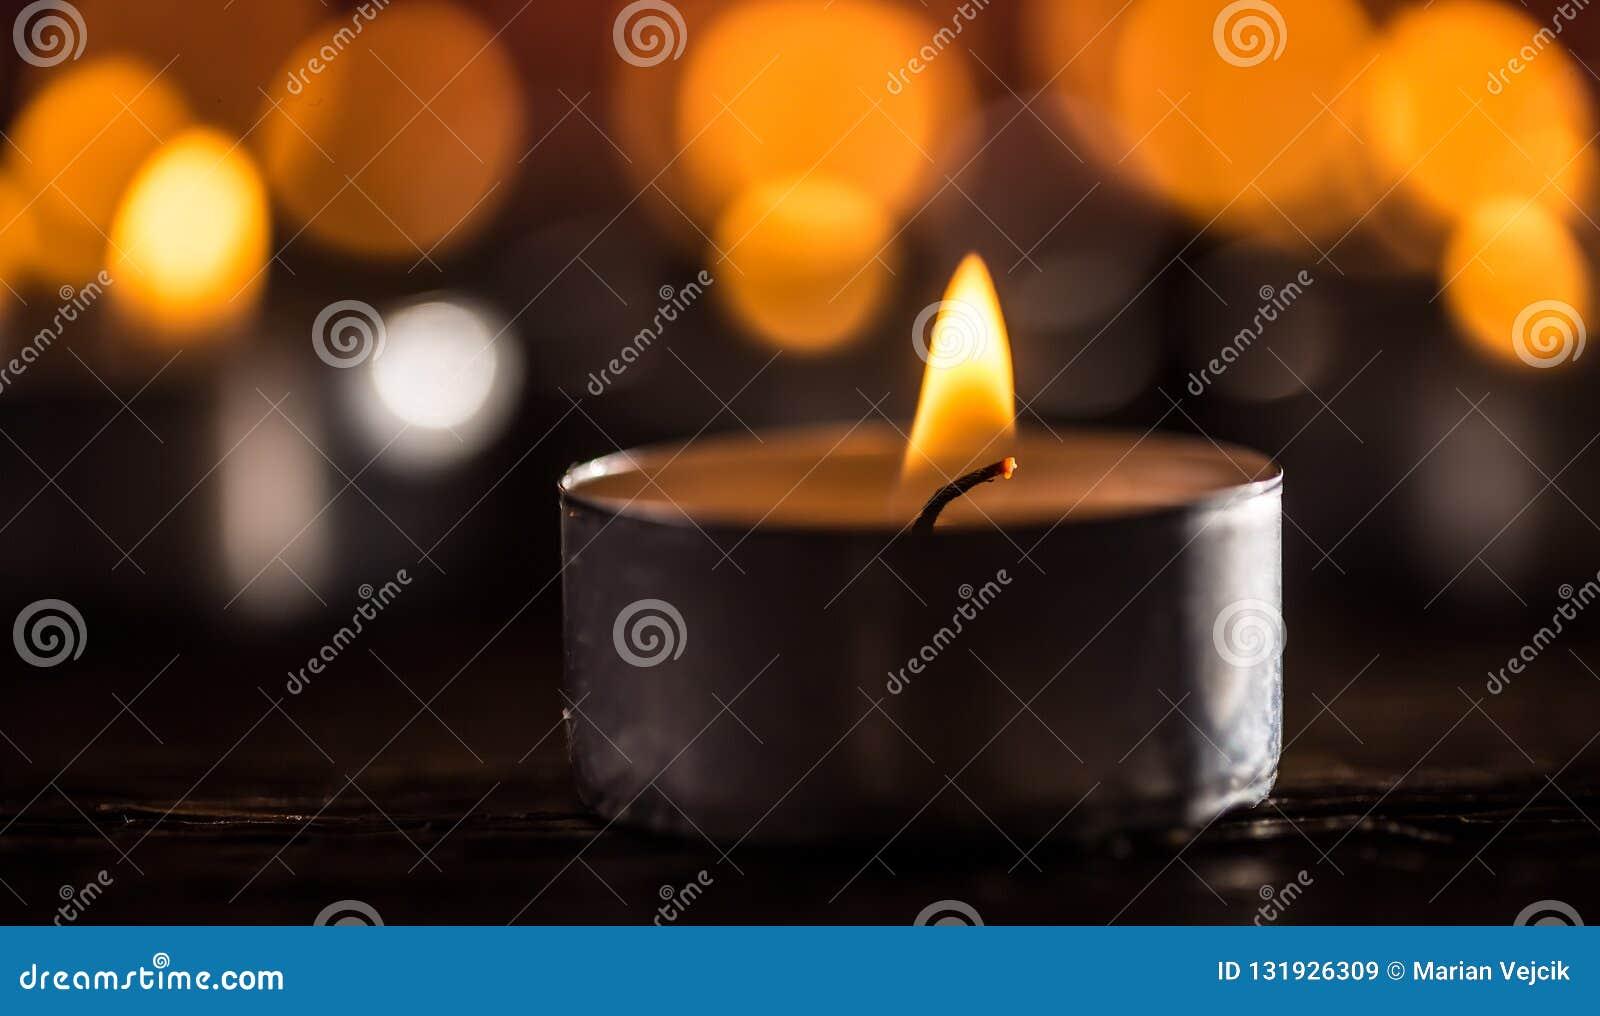 Many candles symolizing funeral religios christmas spa celebration birthday spirituality peace memorial or holiday burning